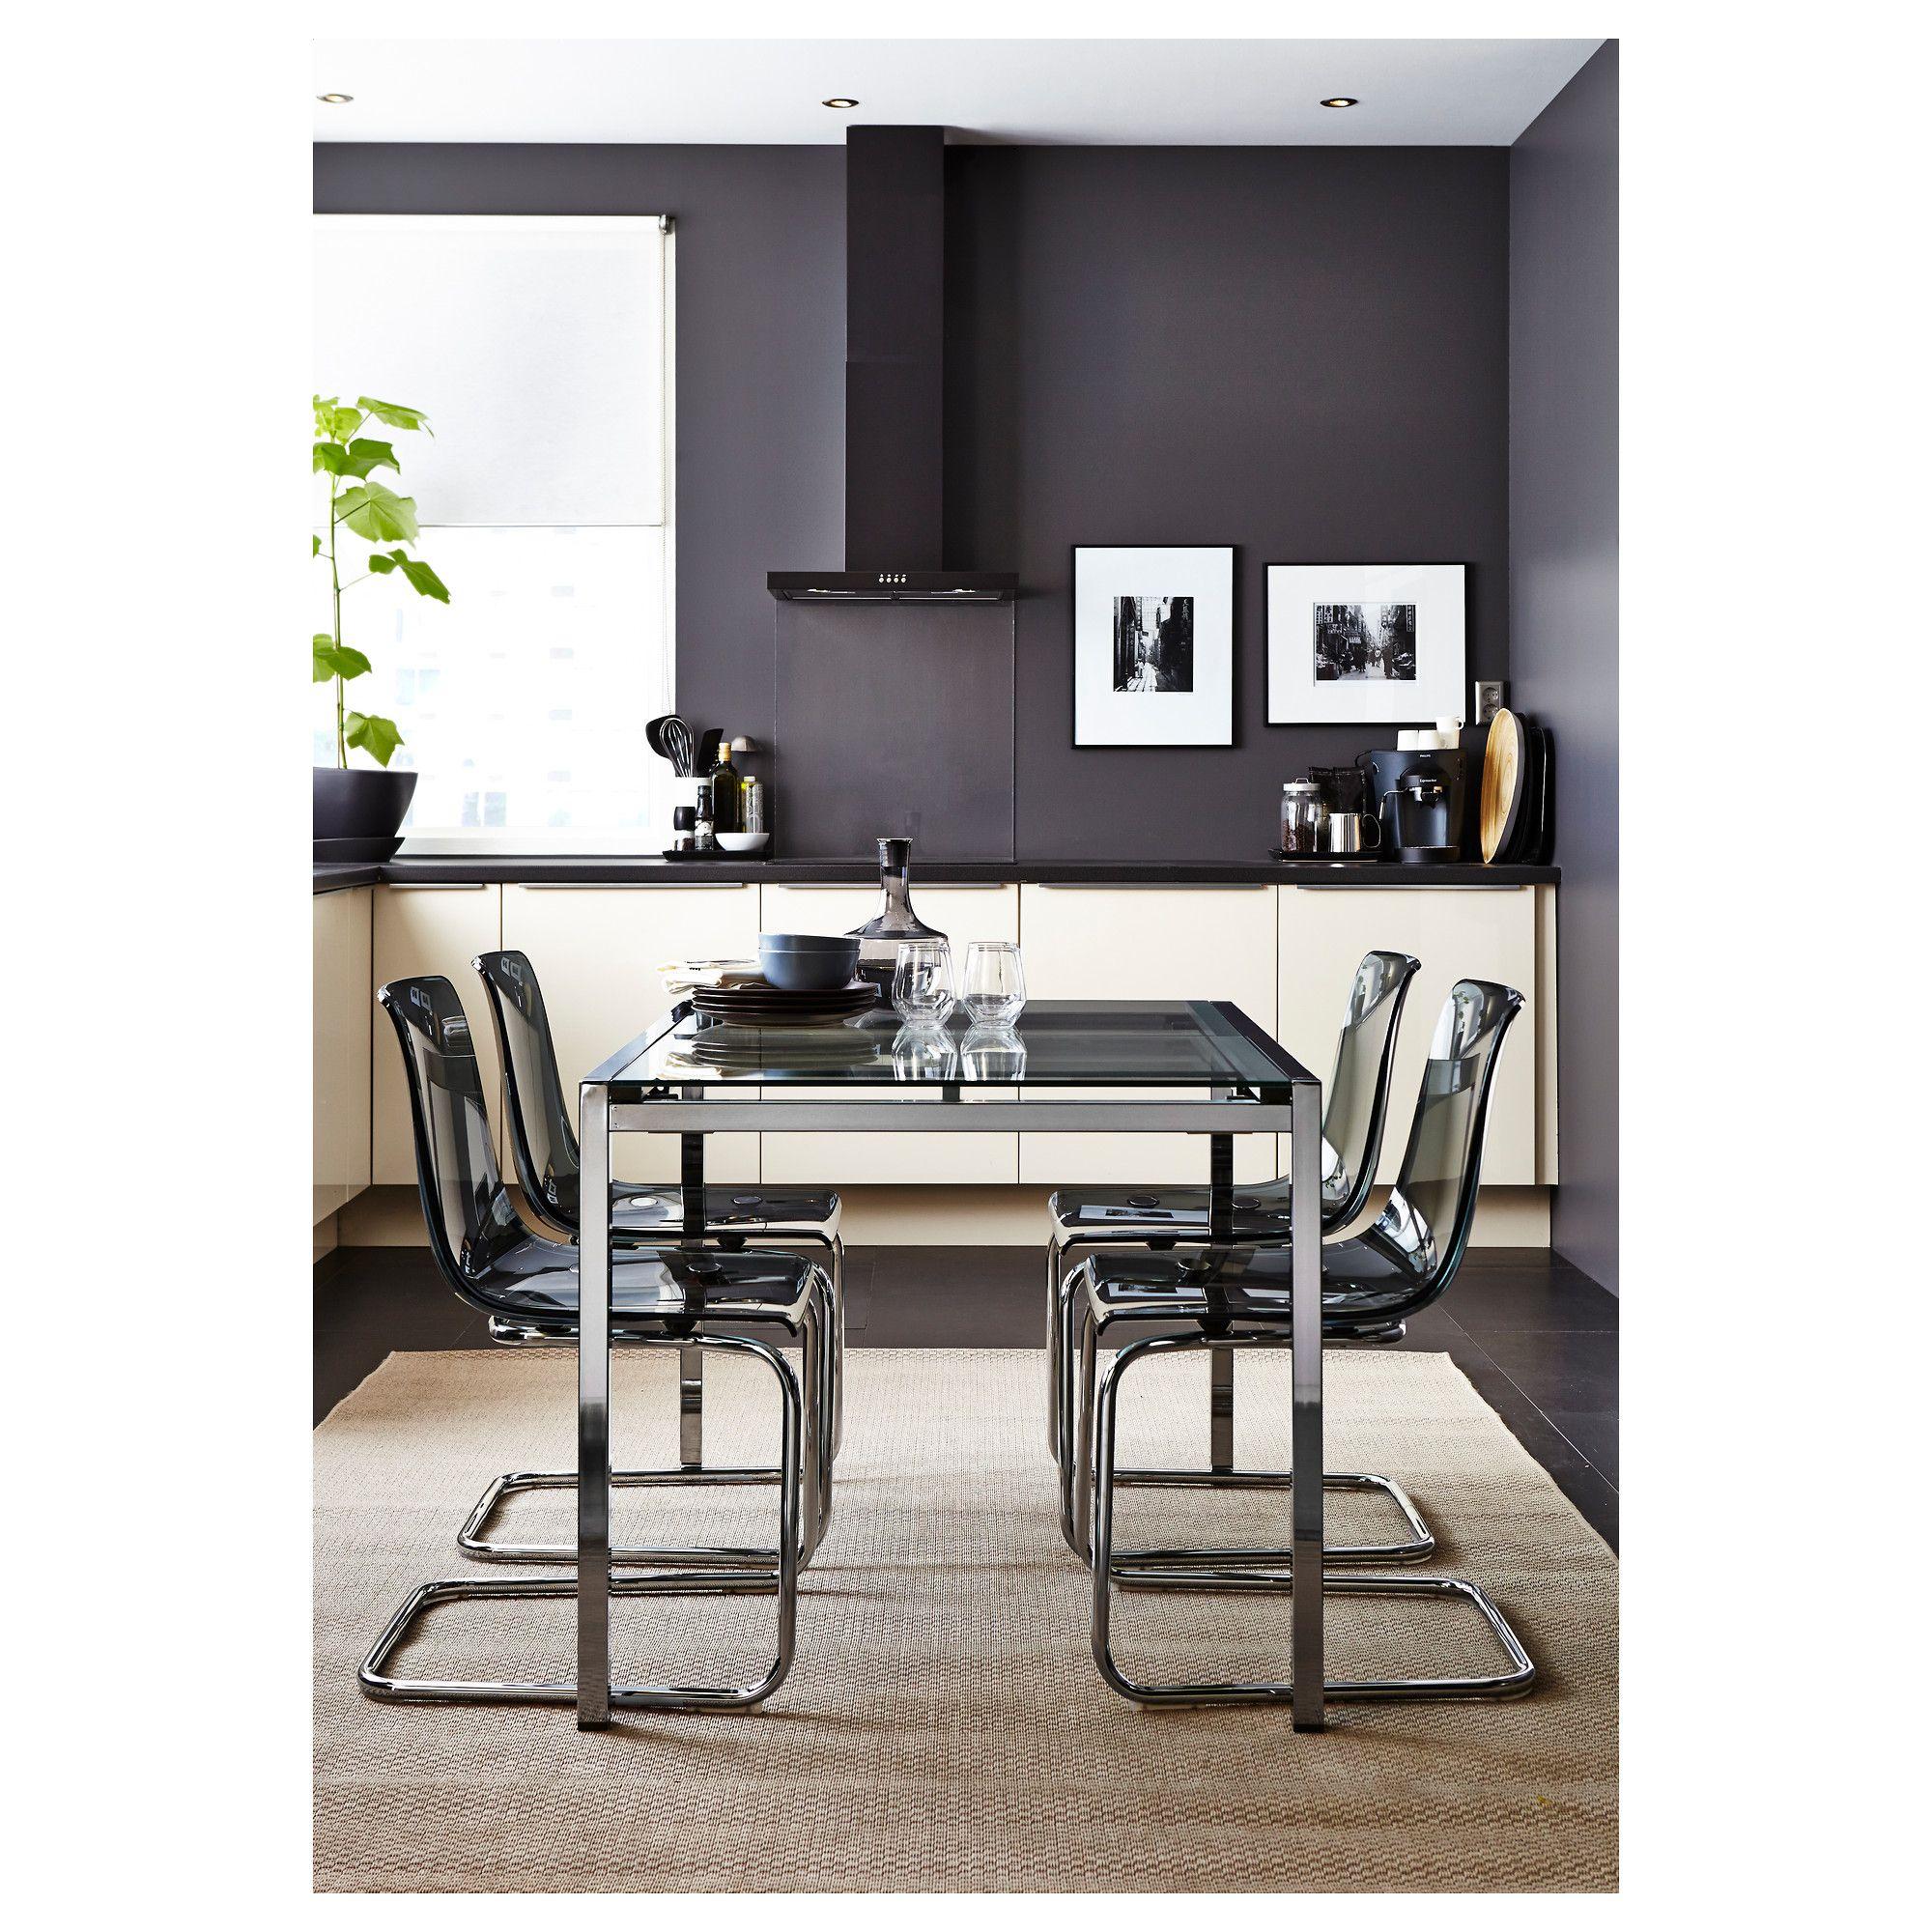 MORUM Χαλί, χαμηλή πλέξη IKEA (con immagini) Interior